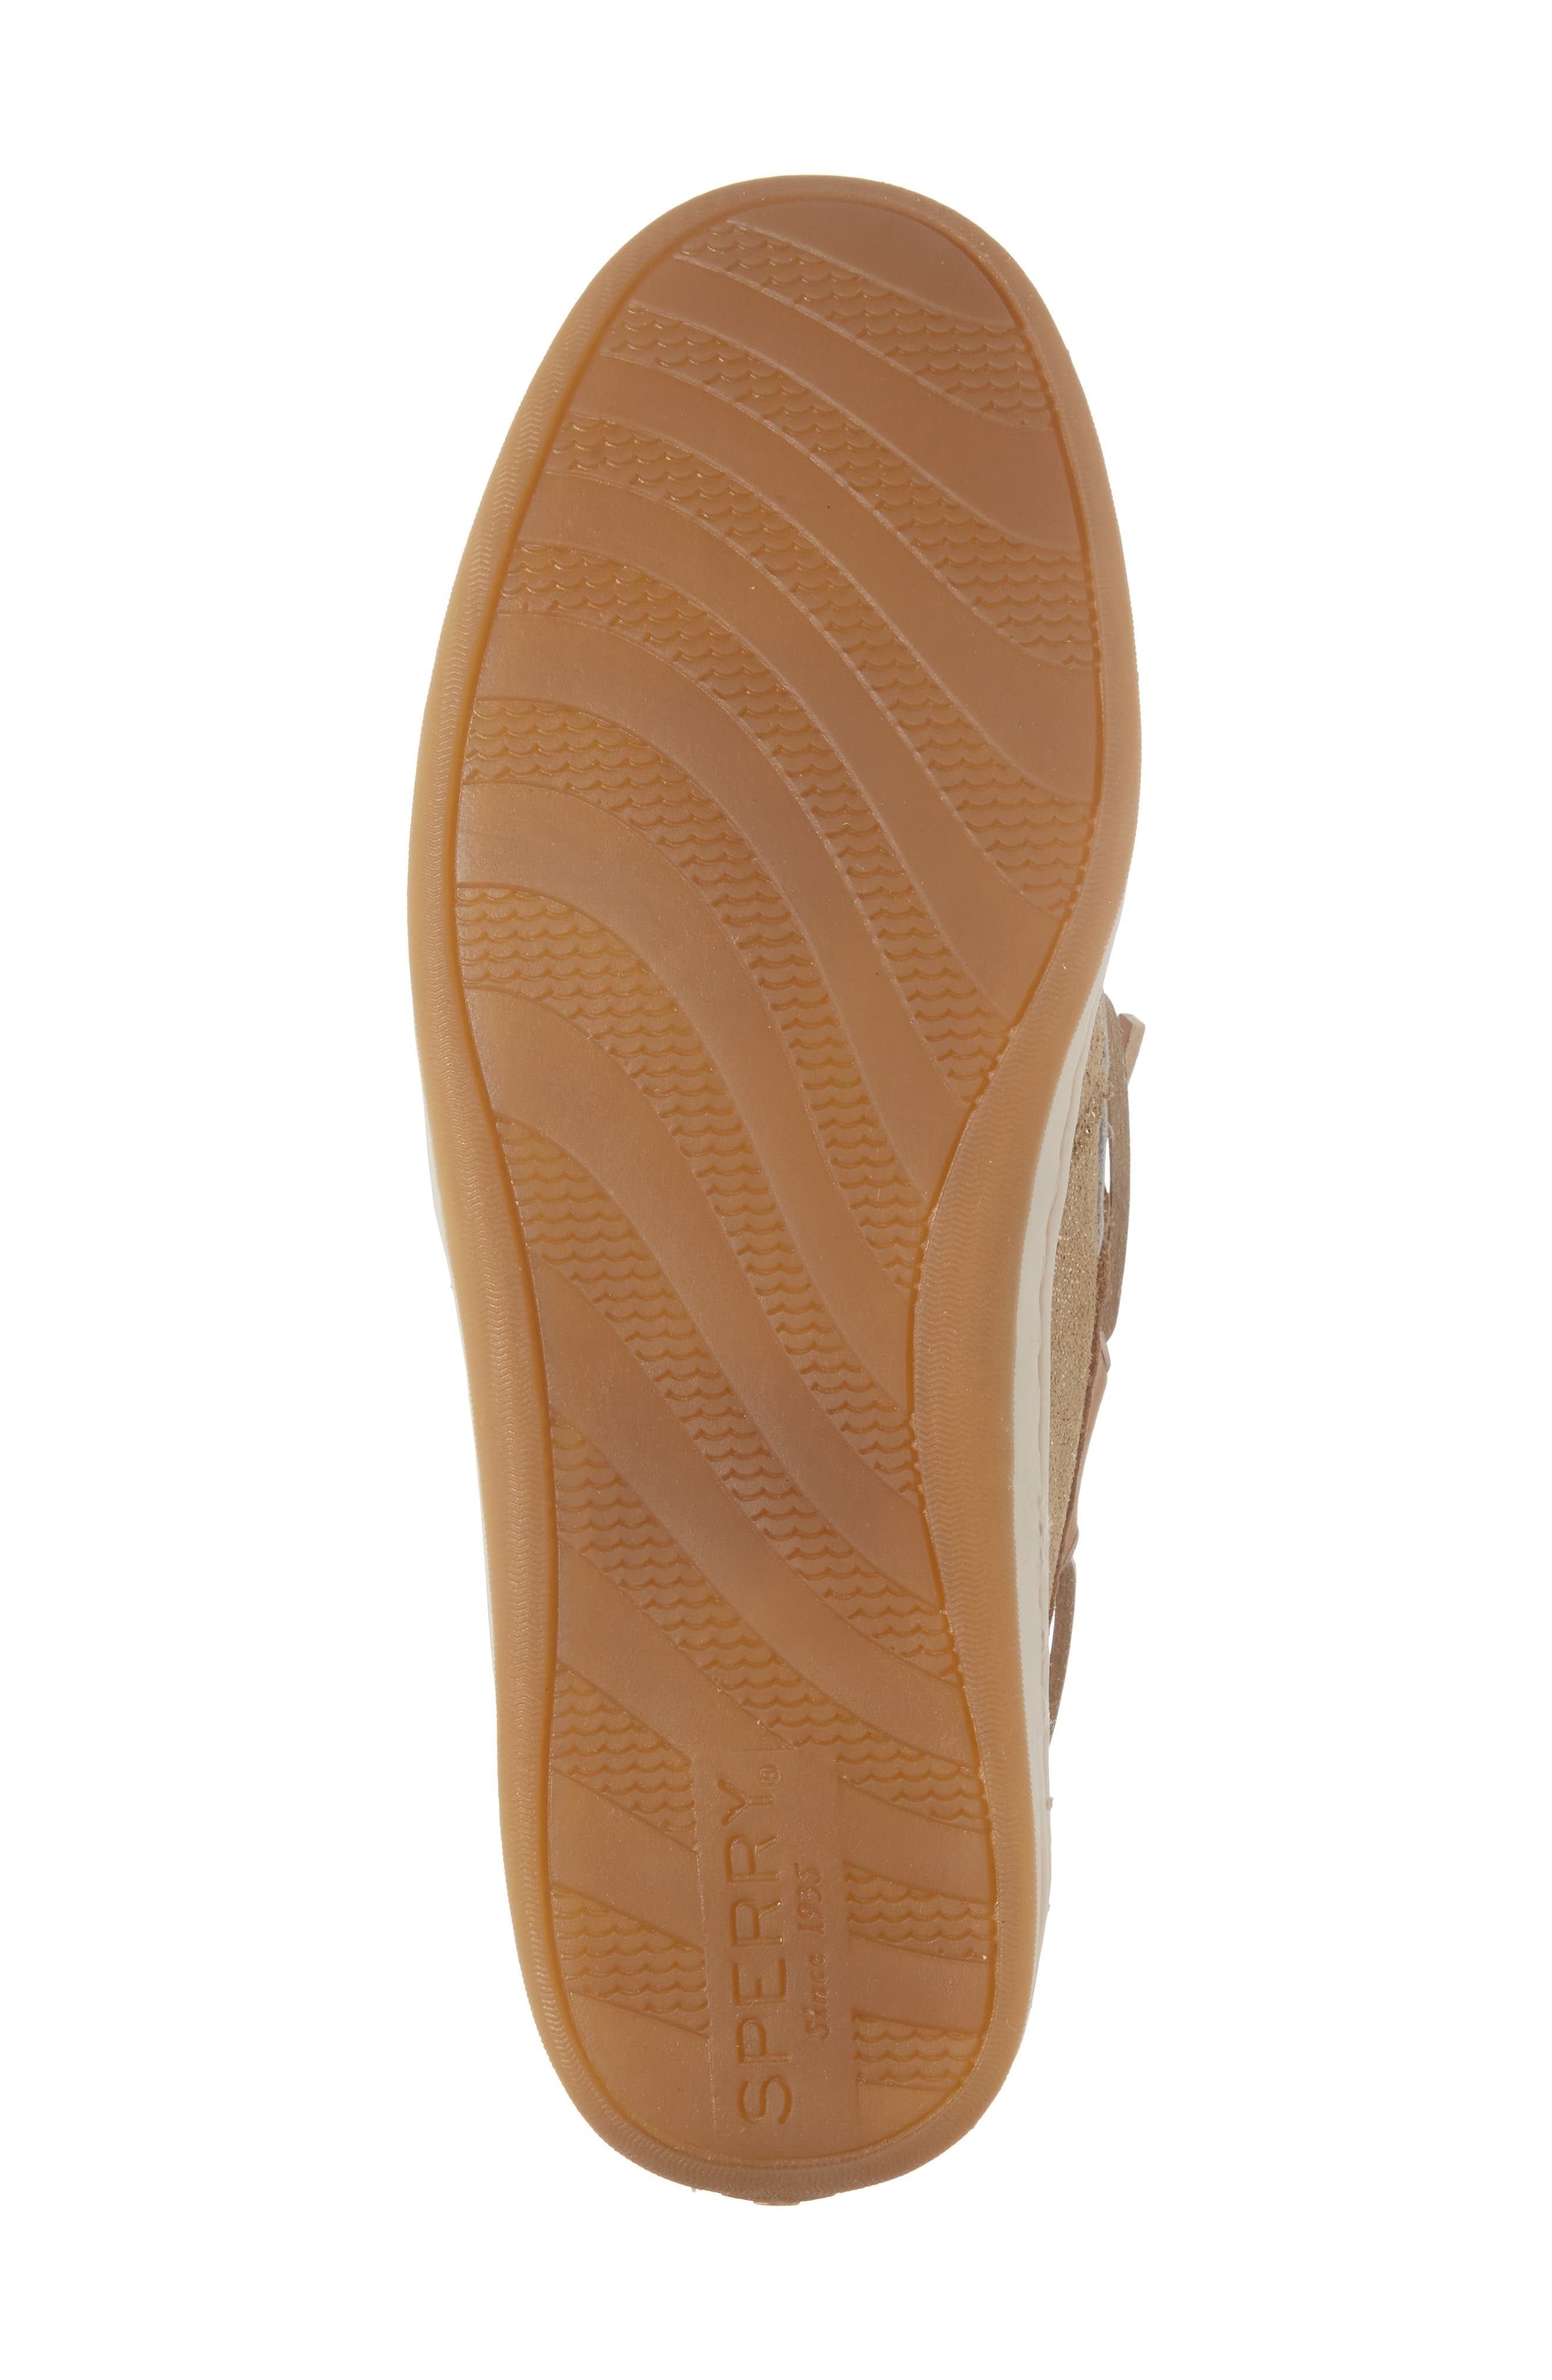 'Songfish' Boat Shoe,                             Alternate thumbnail 6, color,                             Linen/ Gold